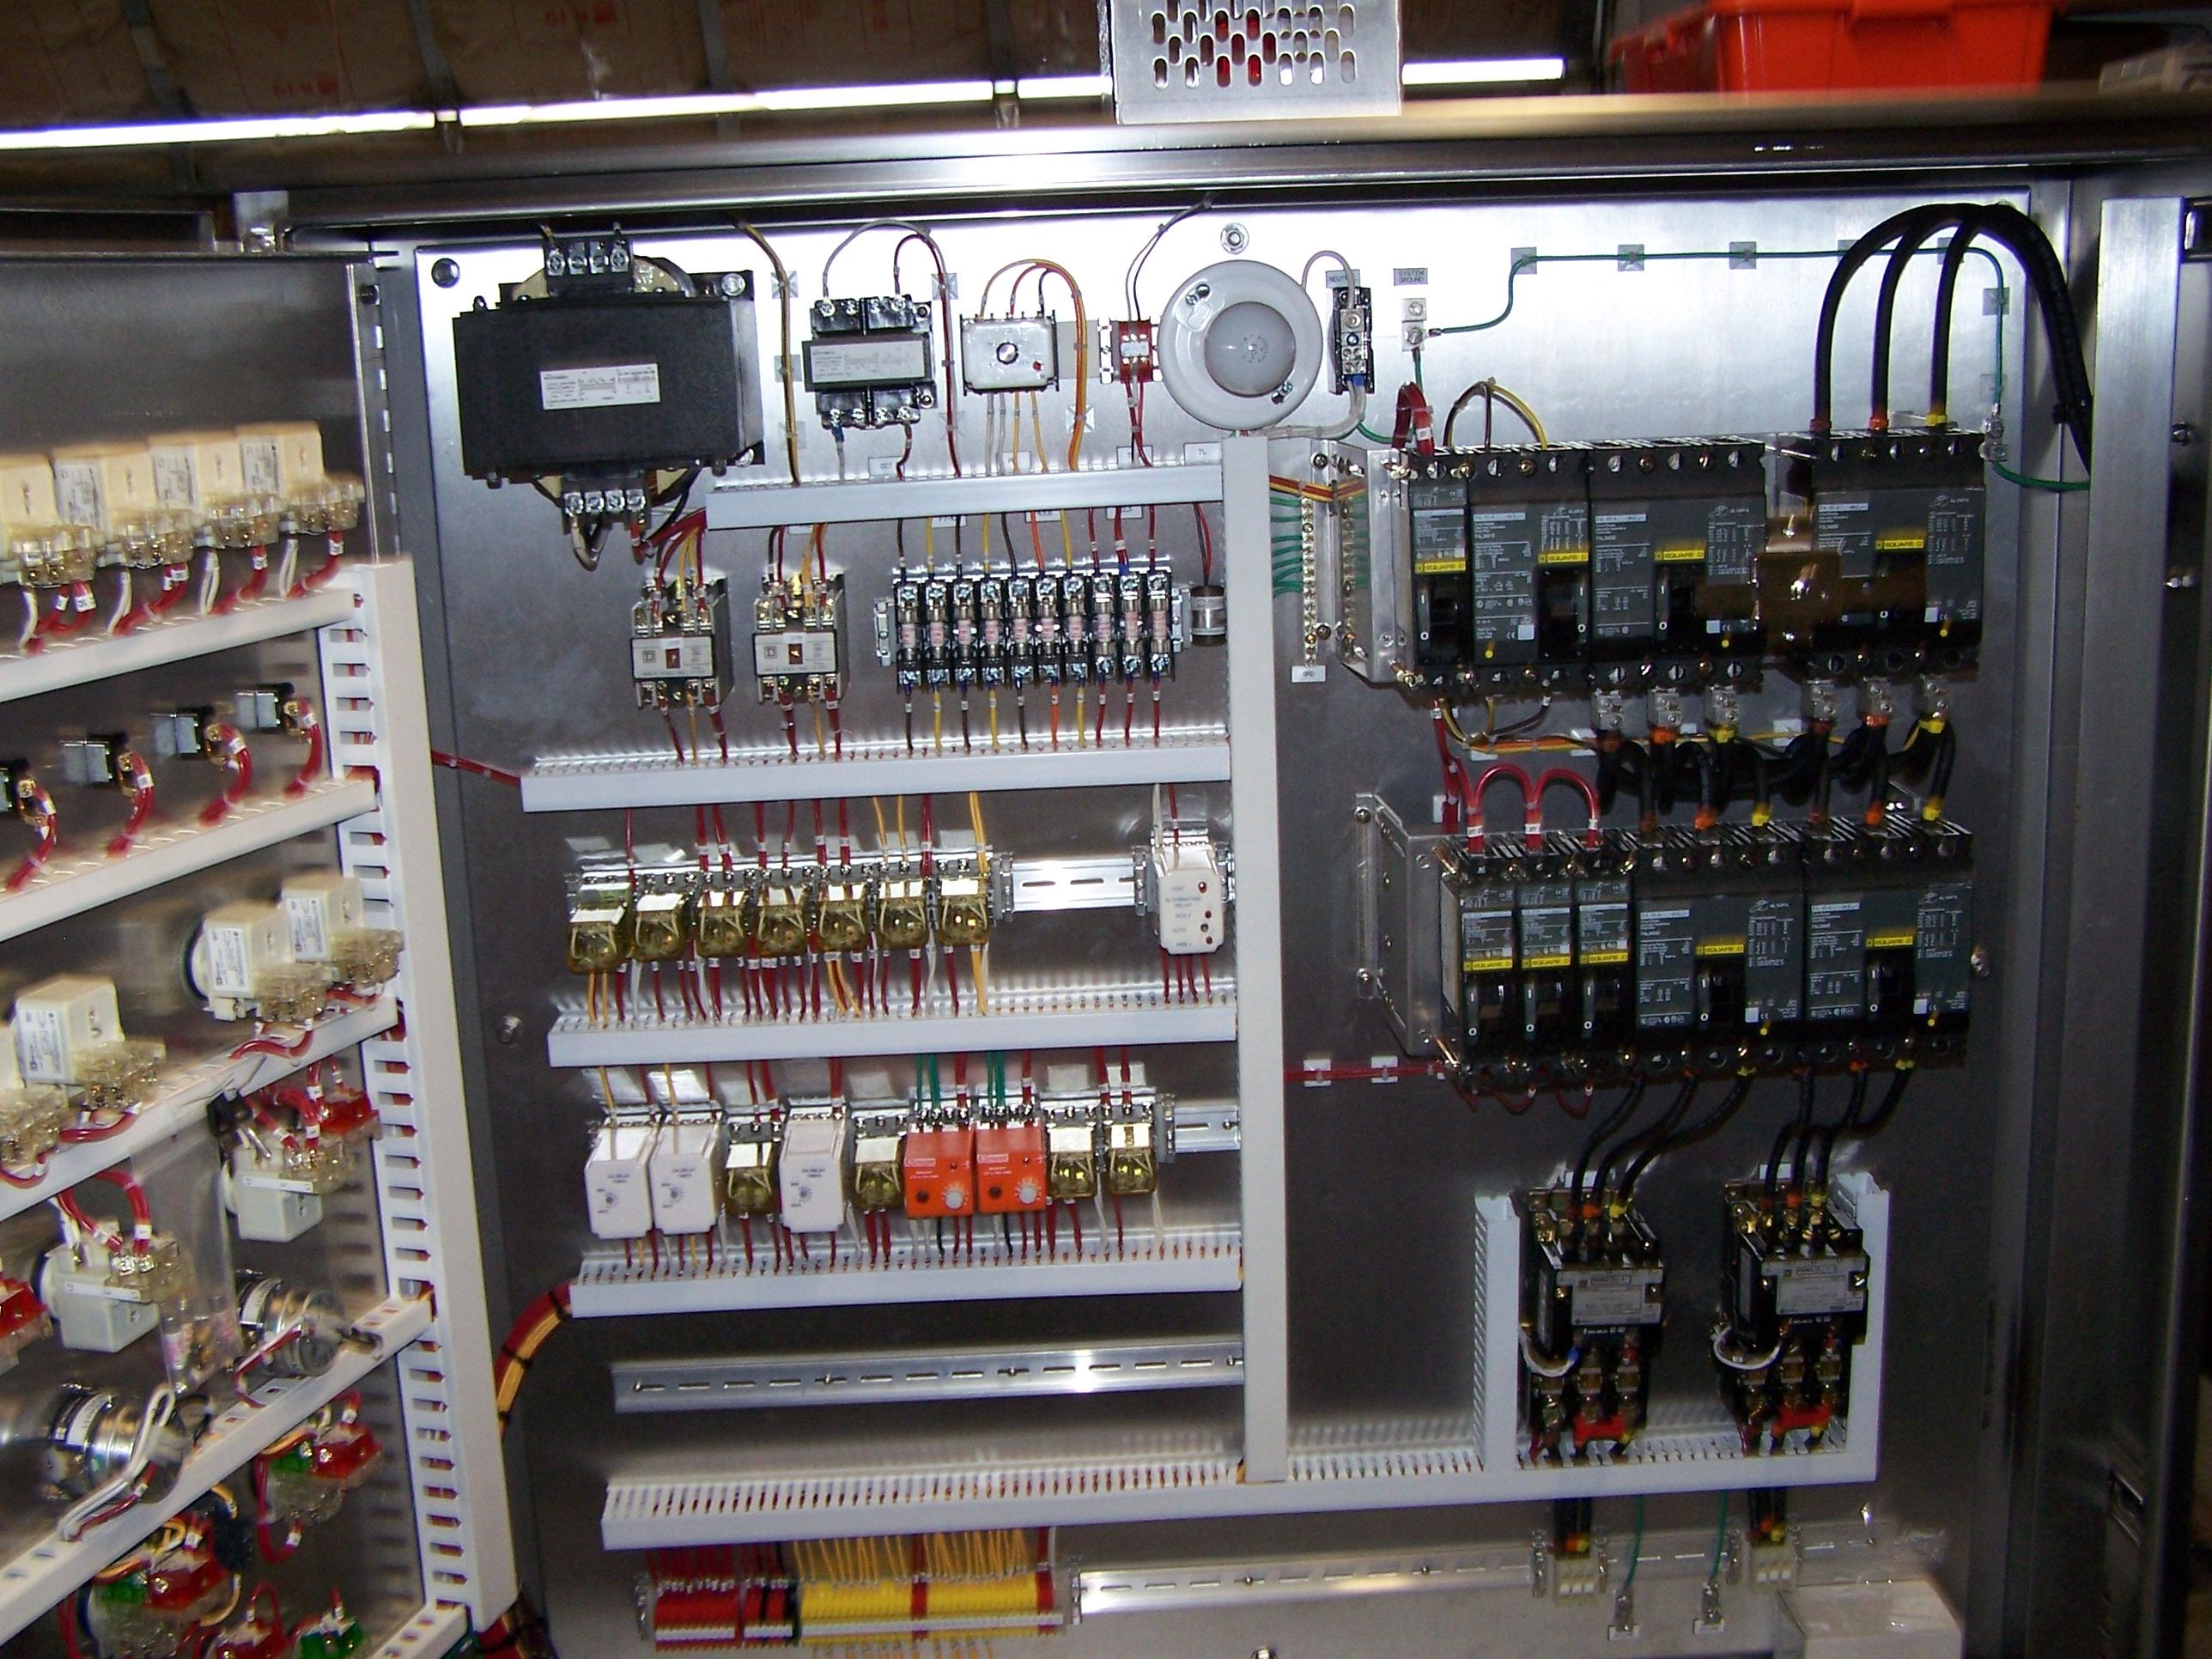 3 phase autotransformer wiring diagram panda bear auto transformer motor control | library